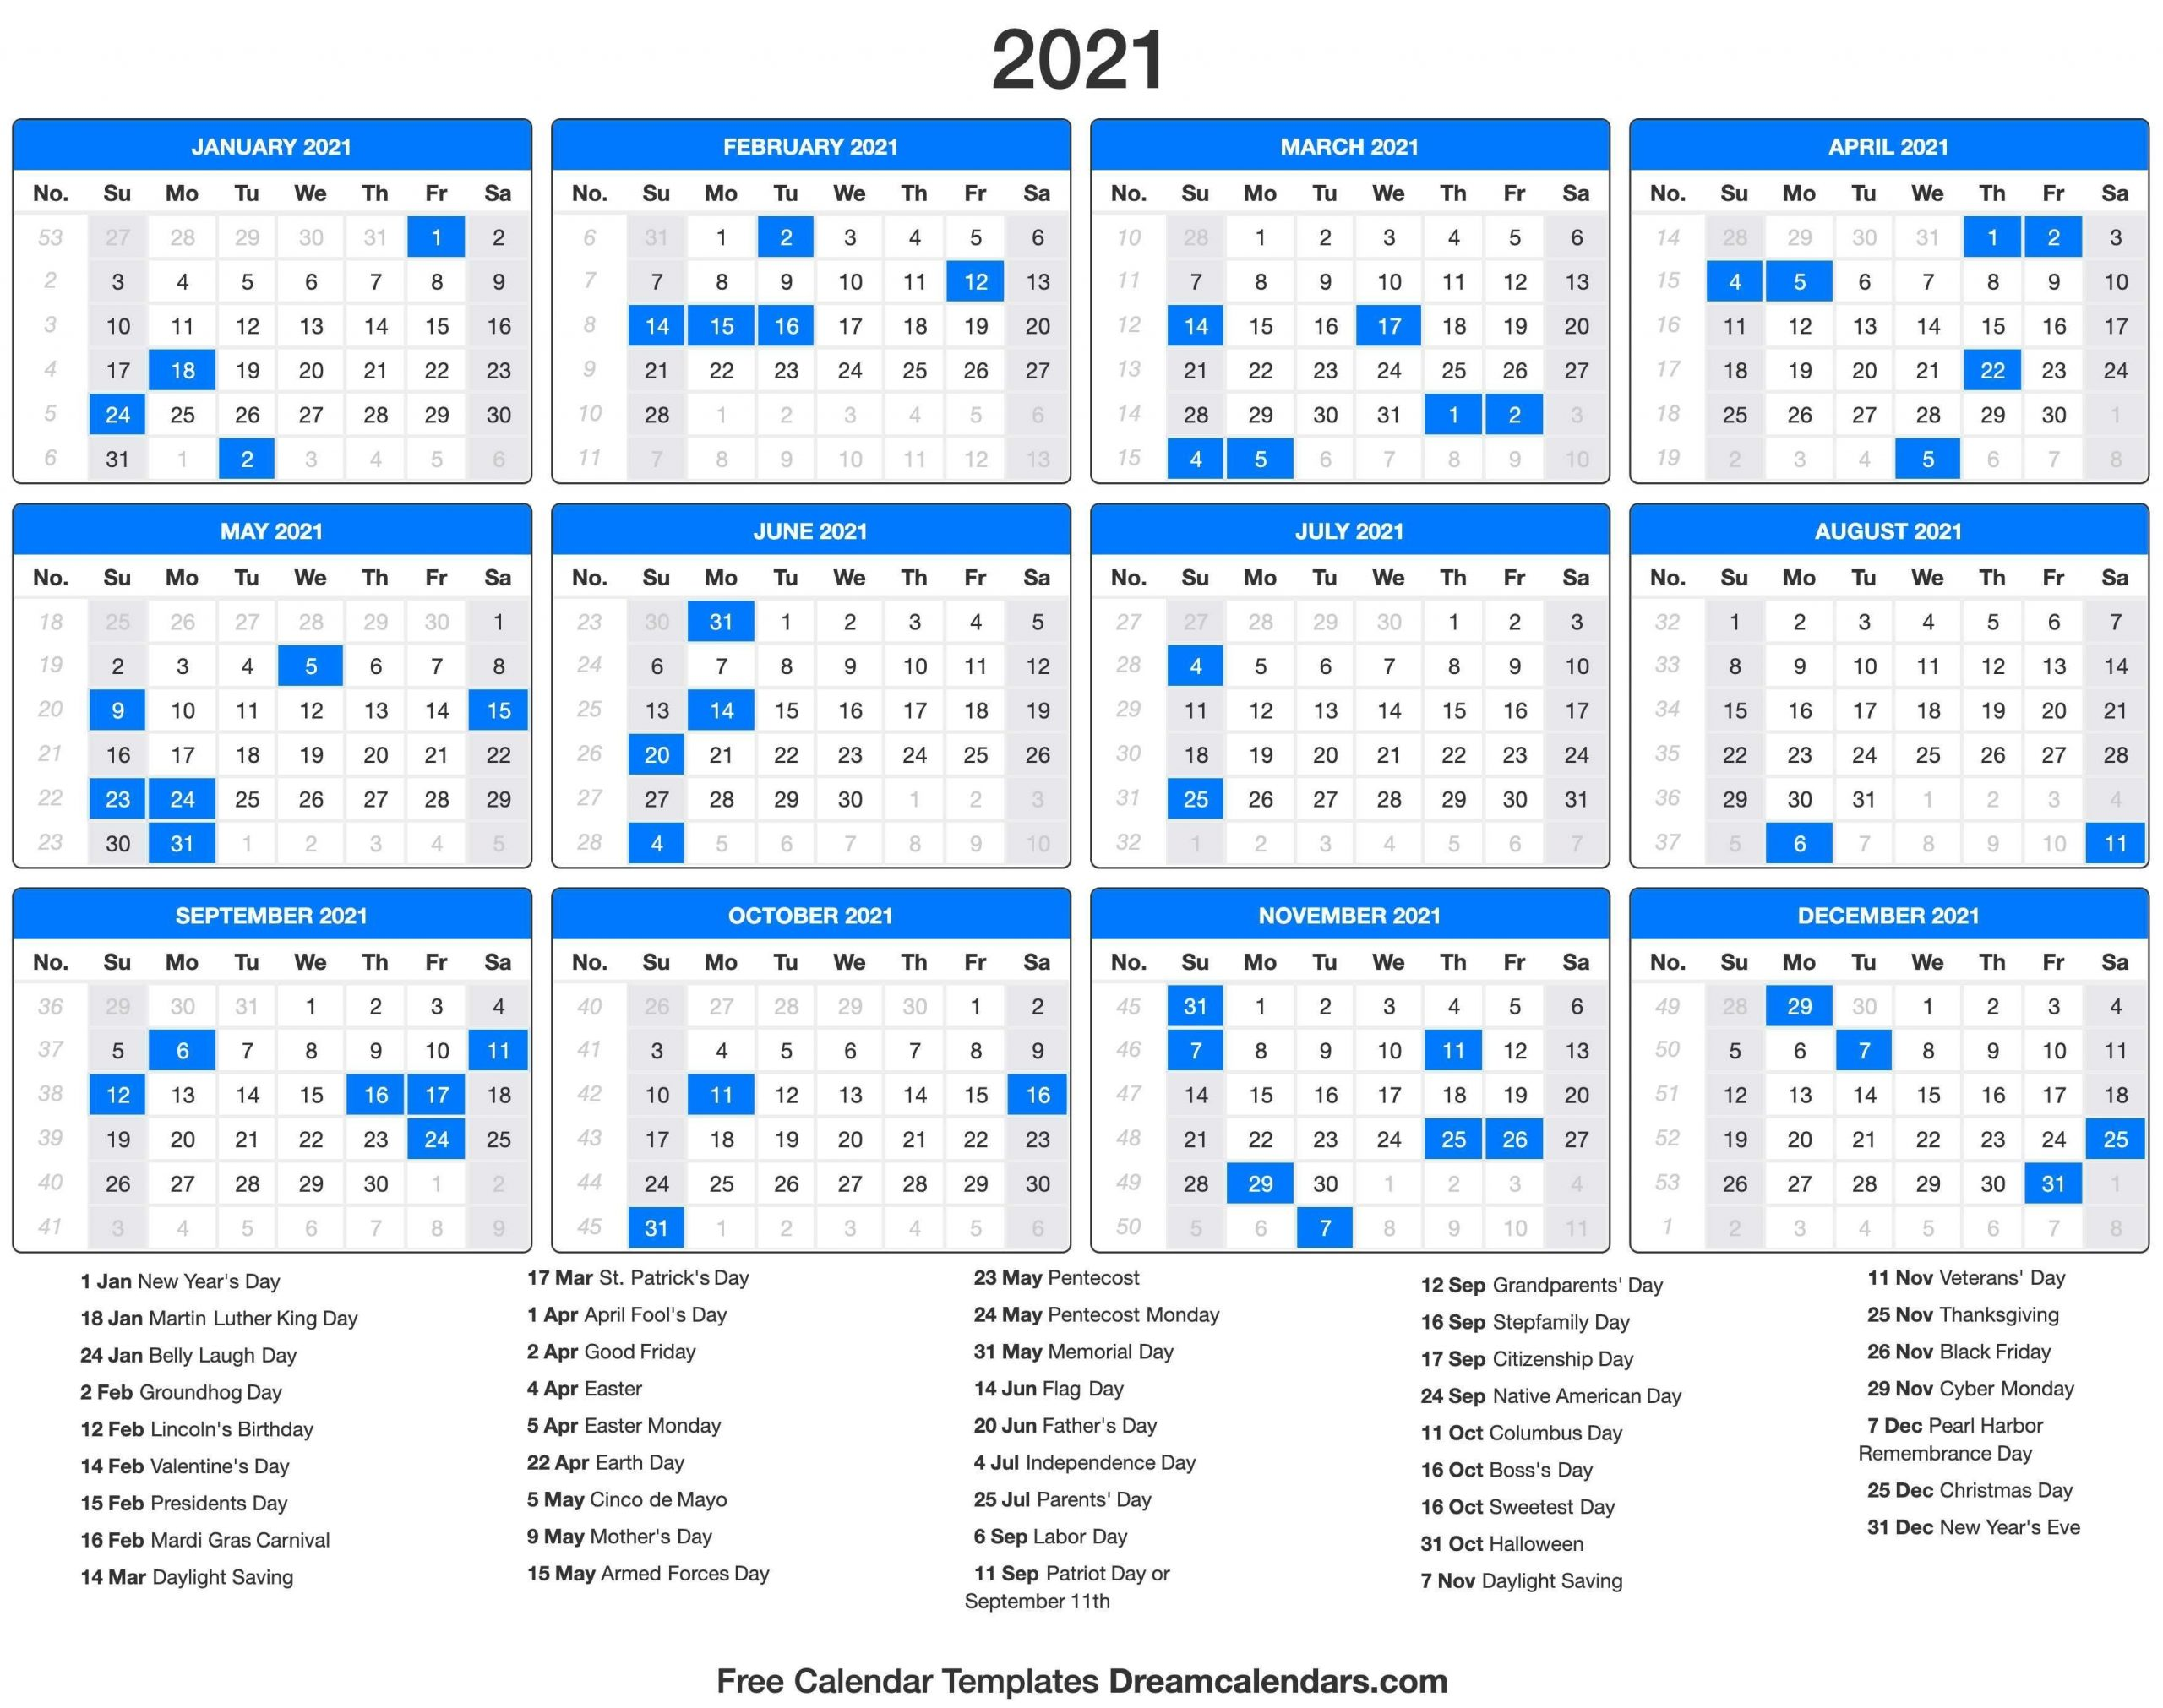 Dream Calendars (Dreamcalendars) On Pinterest